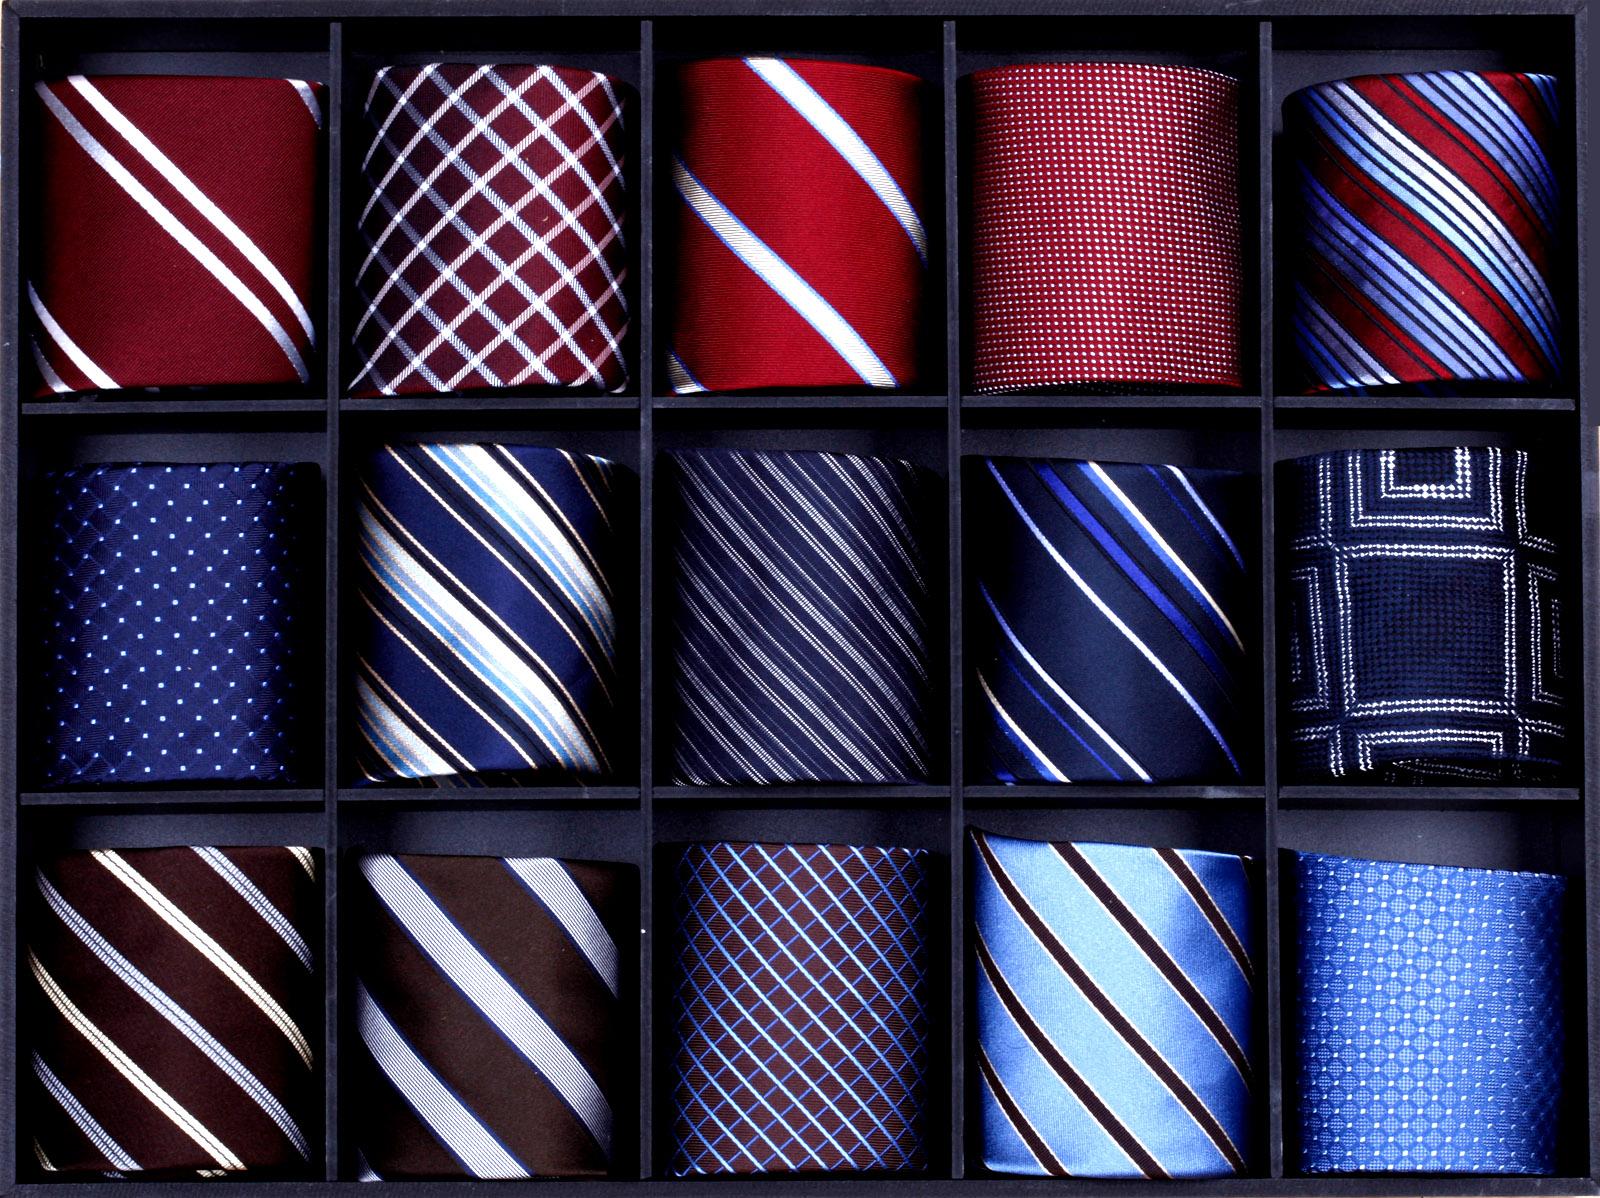 gravatas alexandre taleb 4 - Gravatas